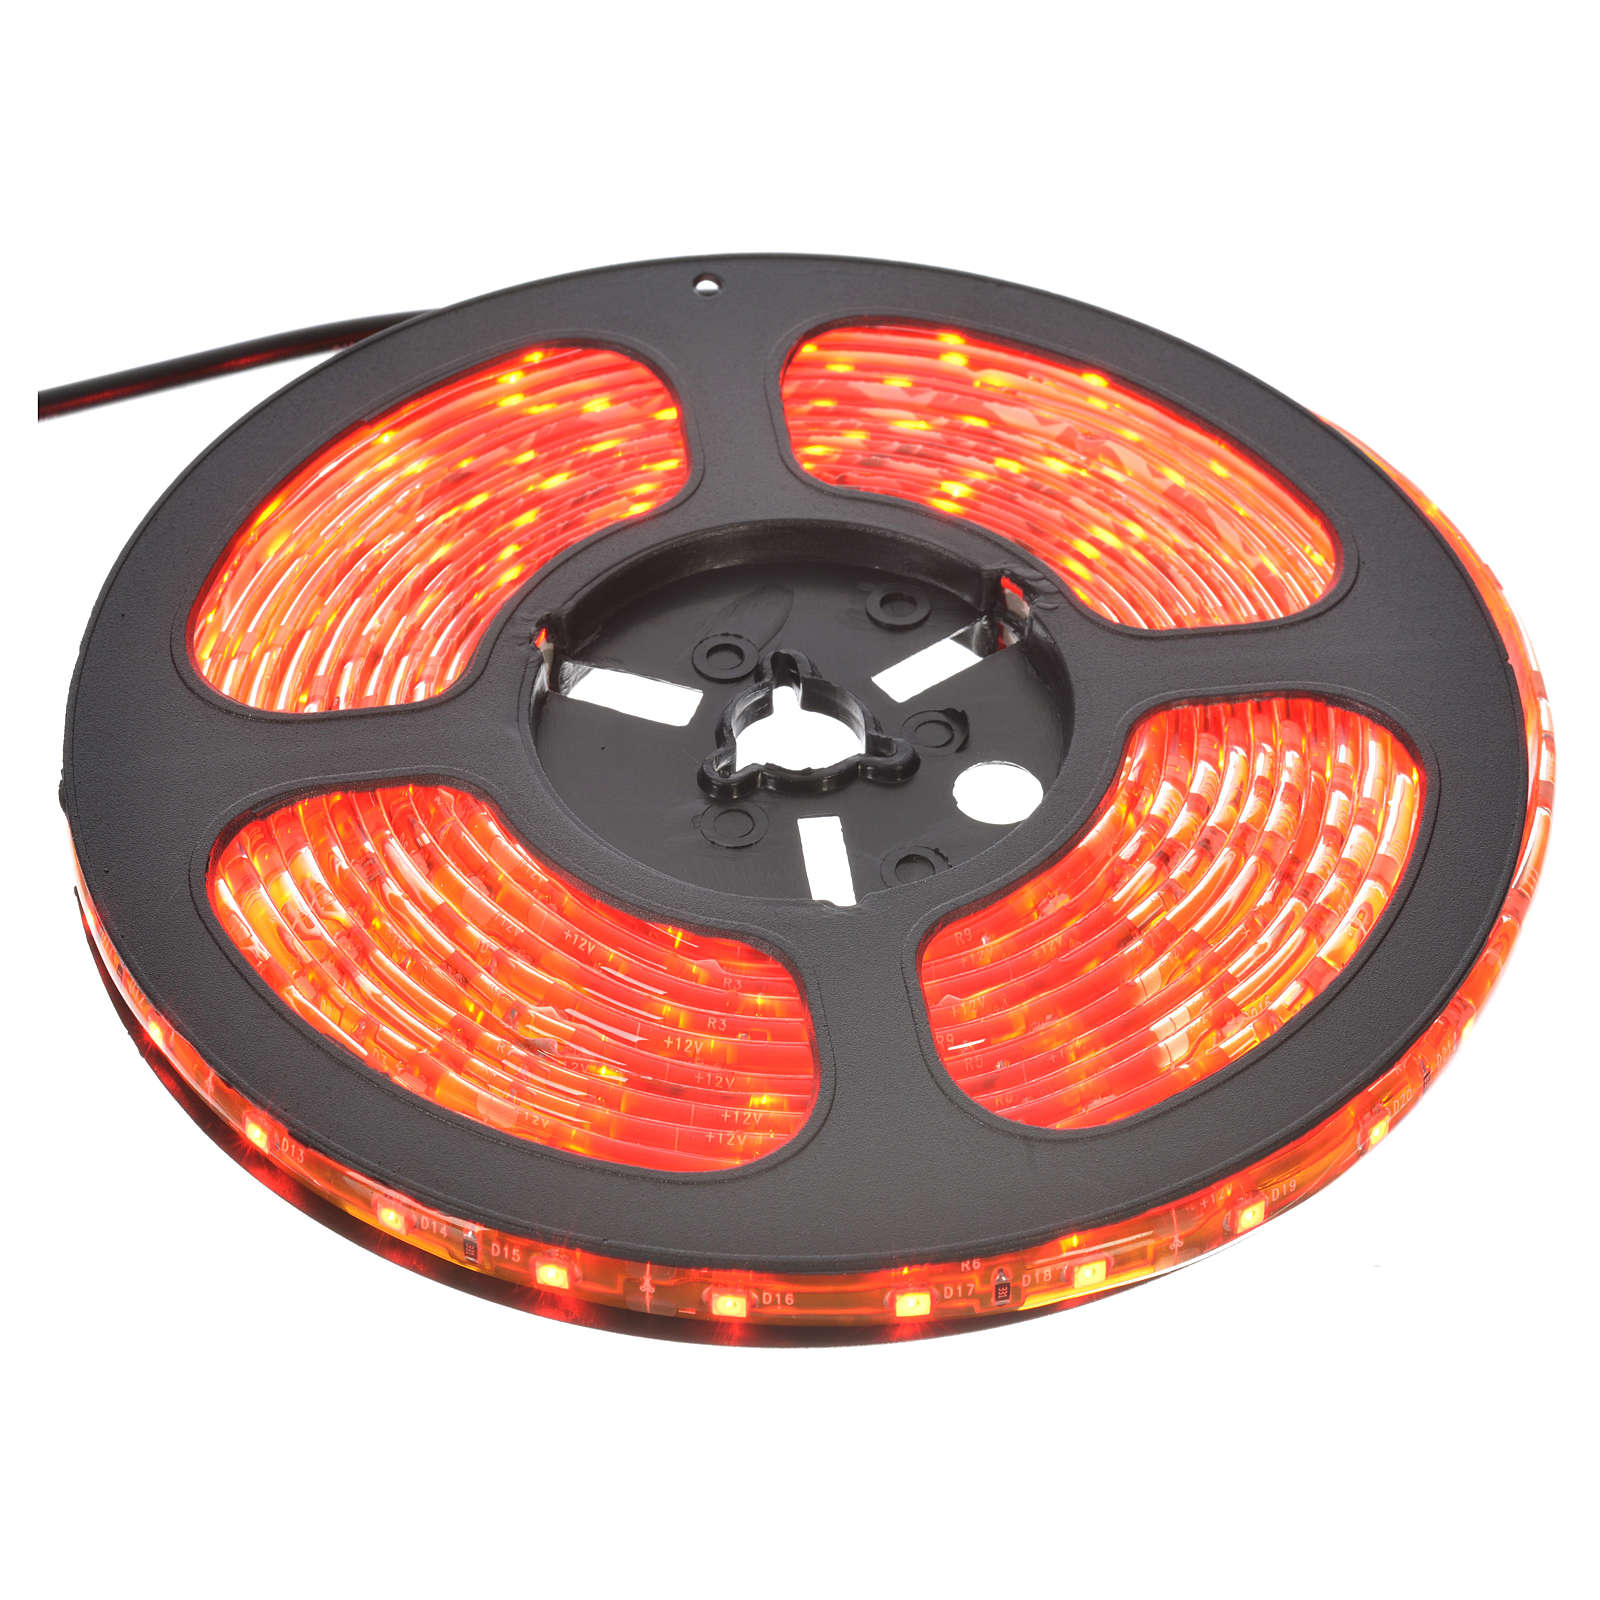 Lampki choinkowe 300 led czerwone pasek 3